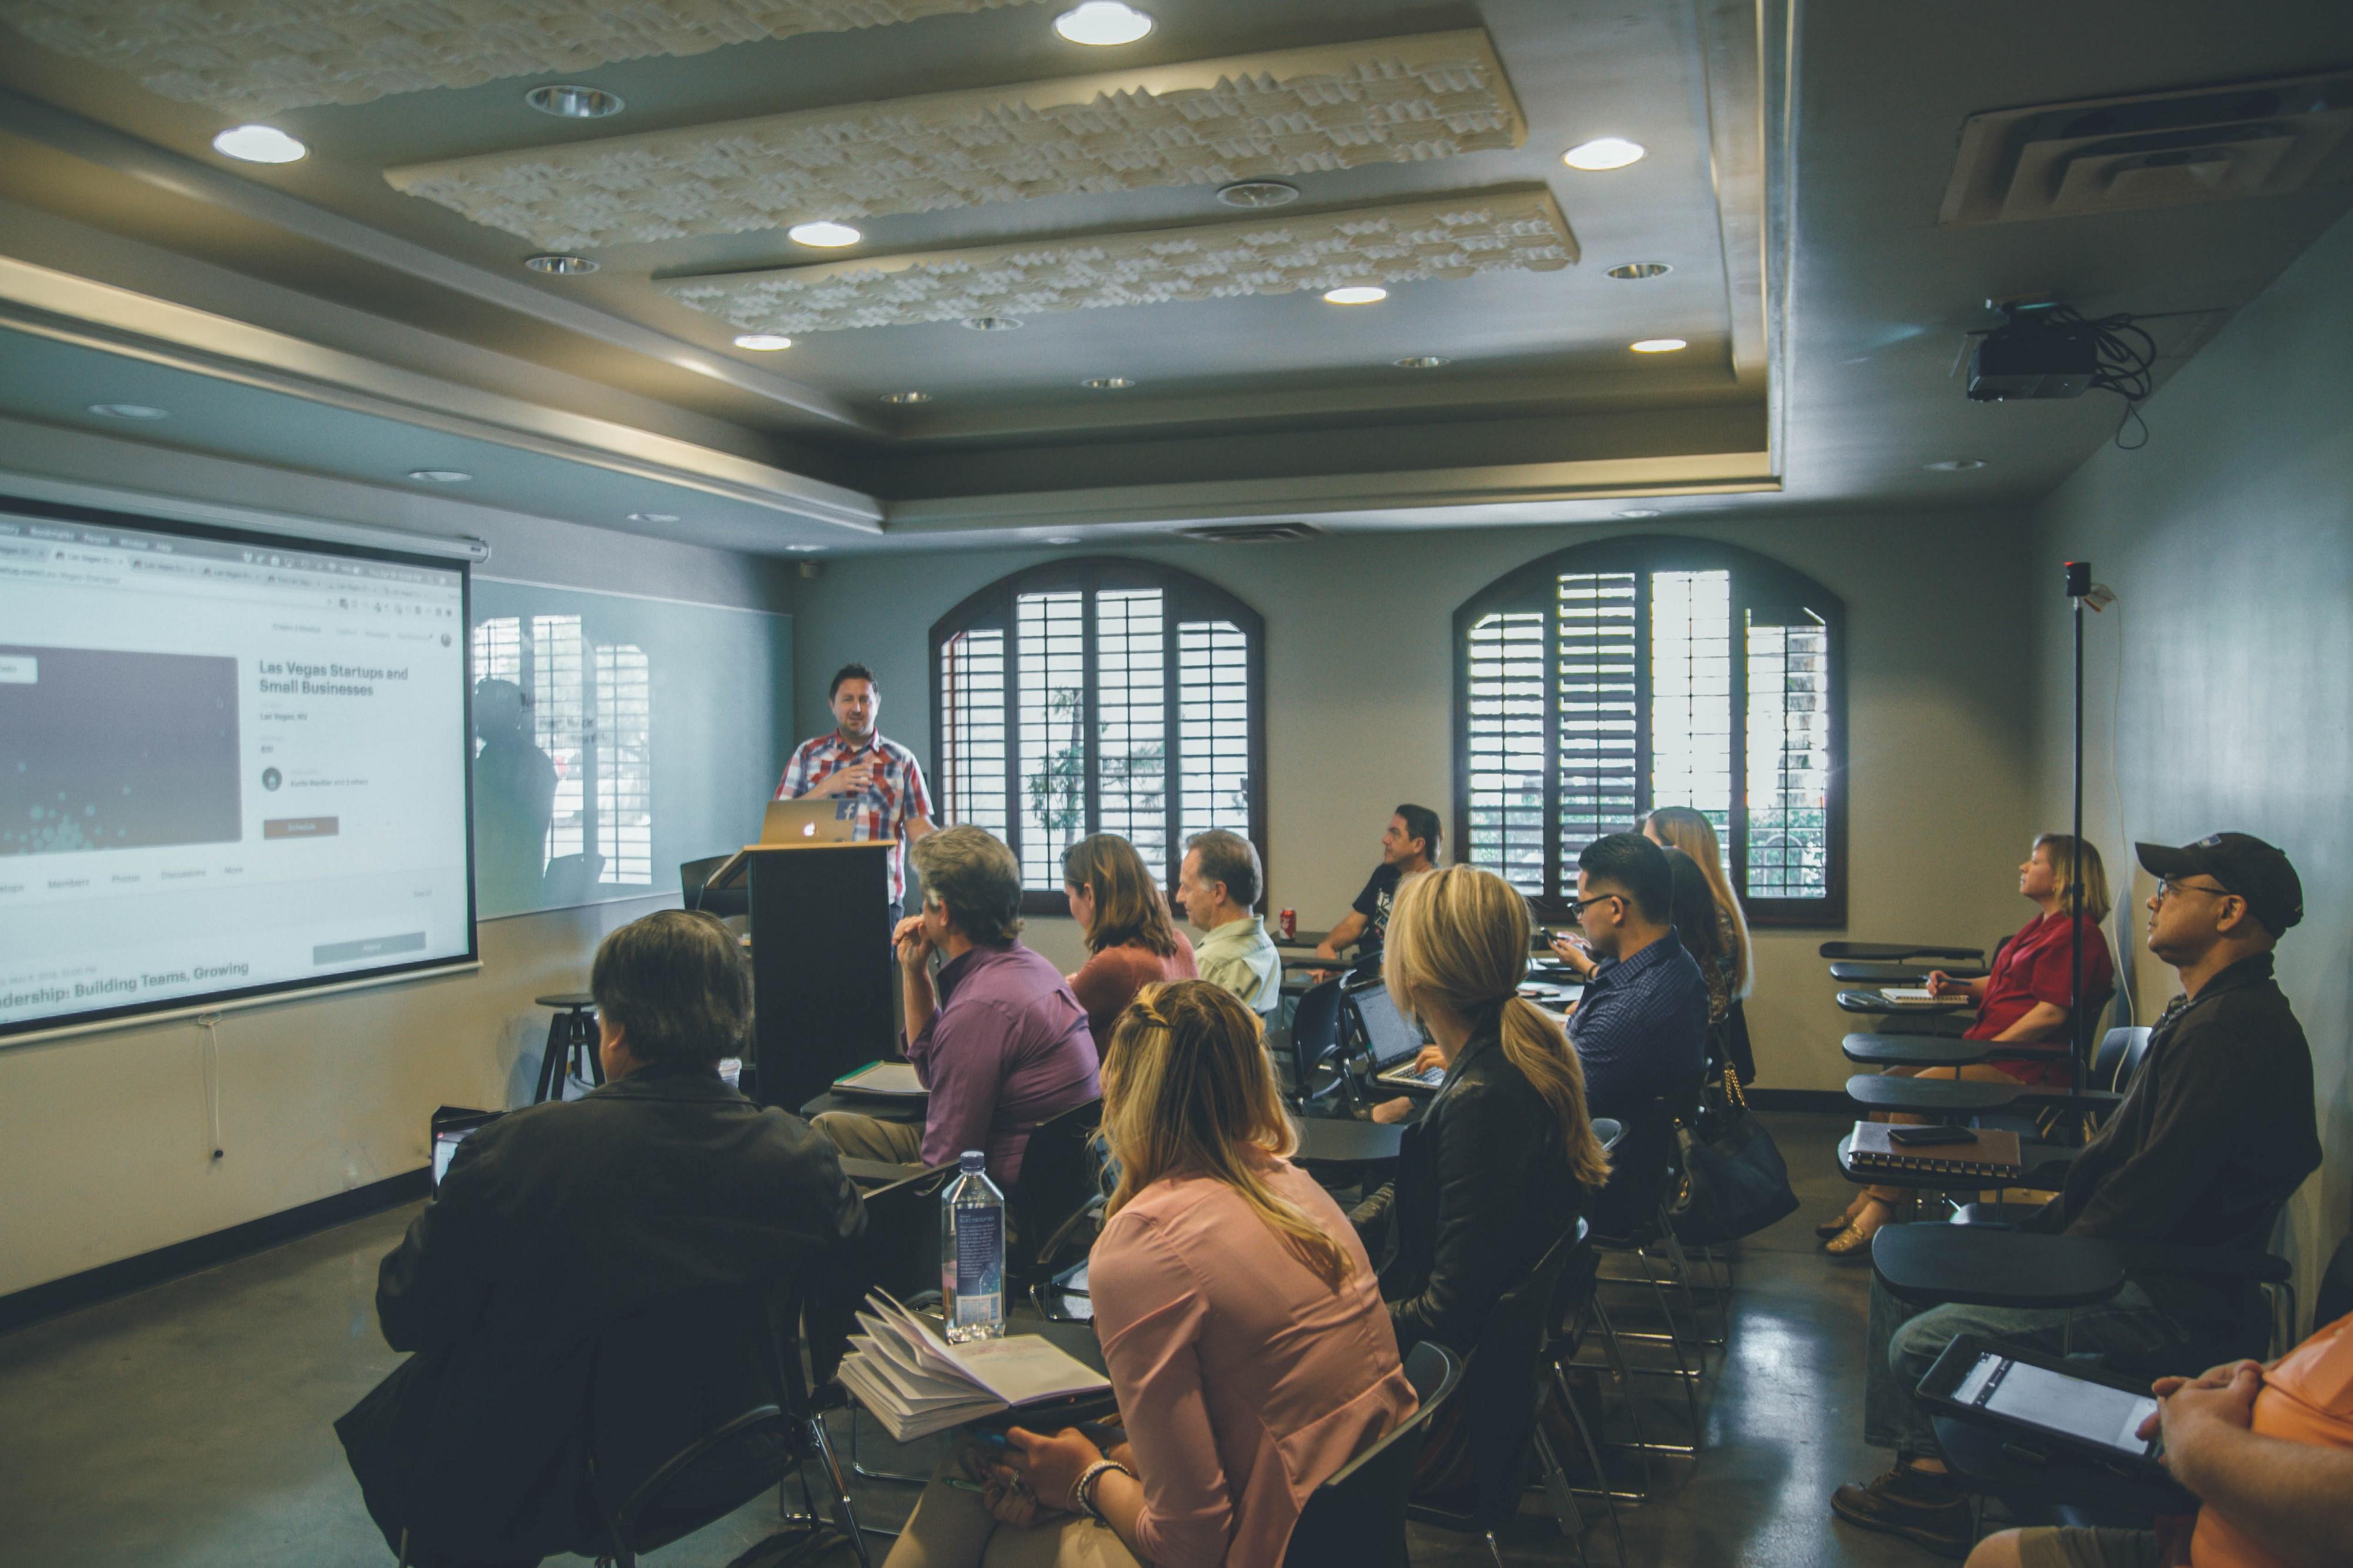 Employee training through a data-driven presentation